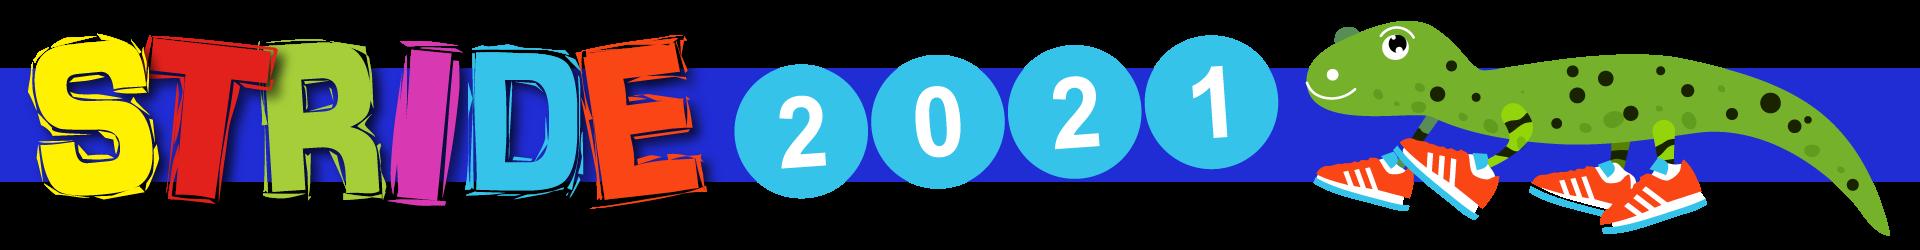 2021 Salamanader Stride header